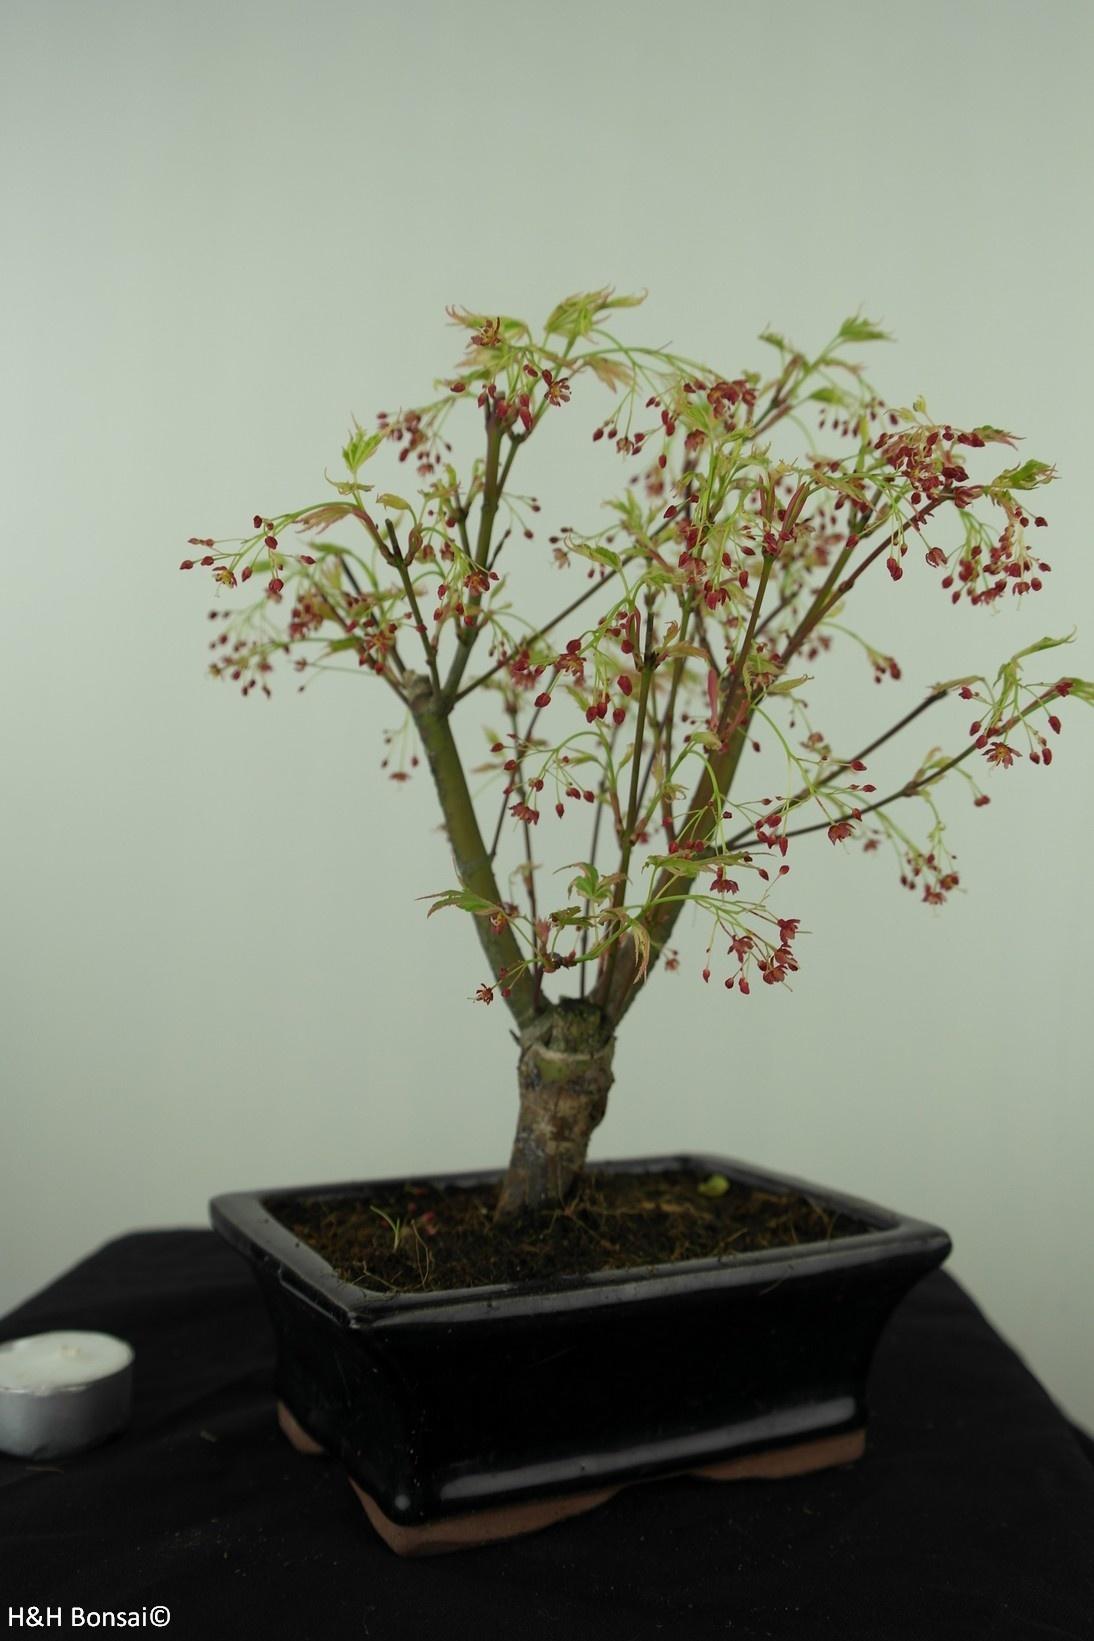 Bonsai Acer palmatum Batafurai, Butterfly, nr. 7543